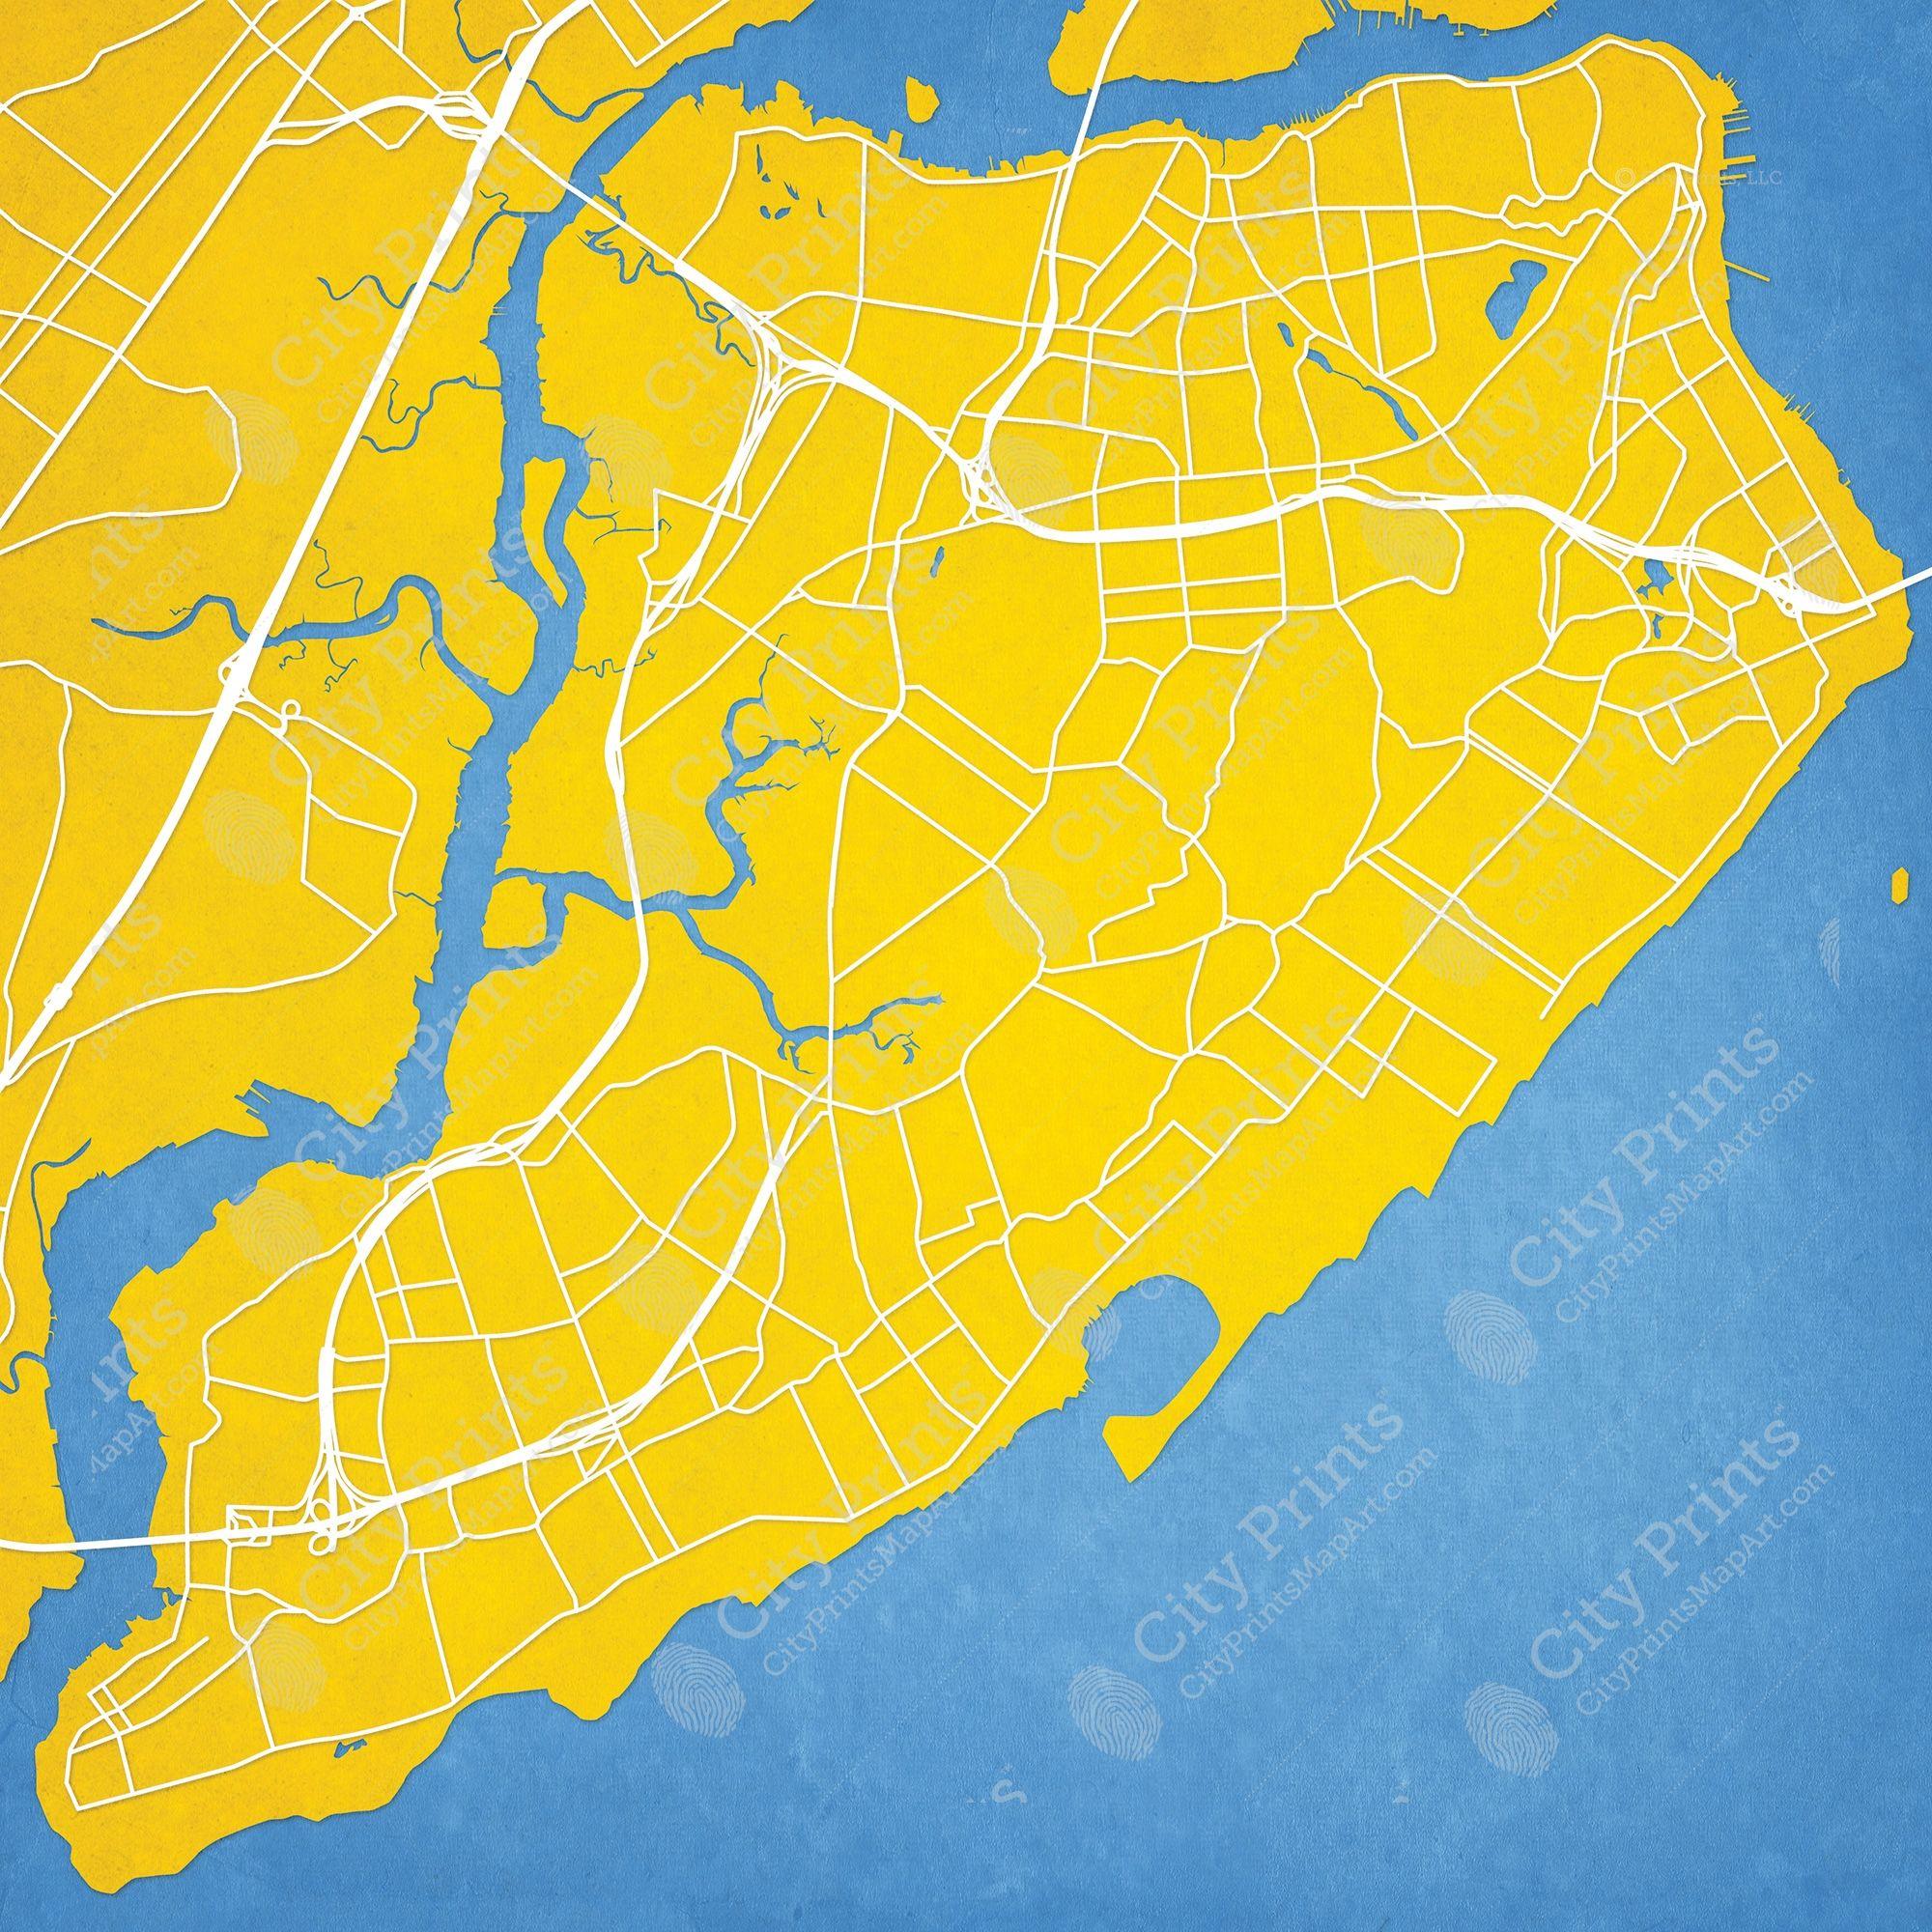 Staten Island, New York Map Art | Staten island, City maps and City